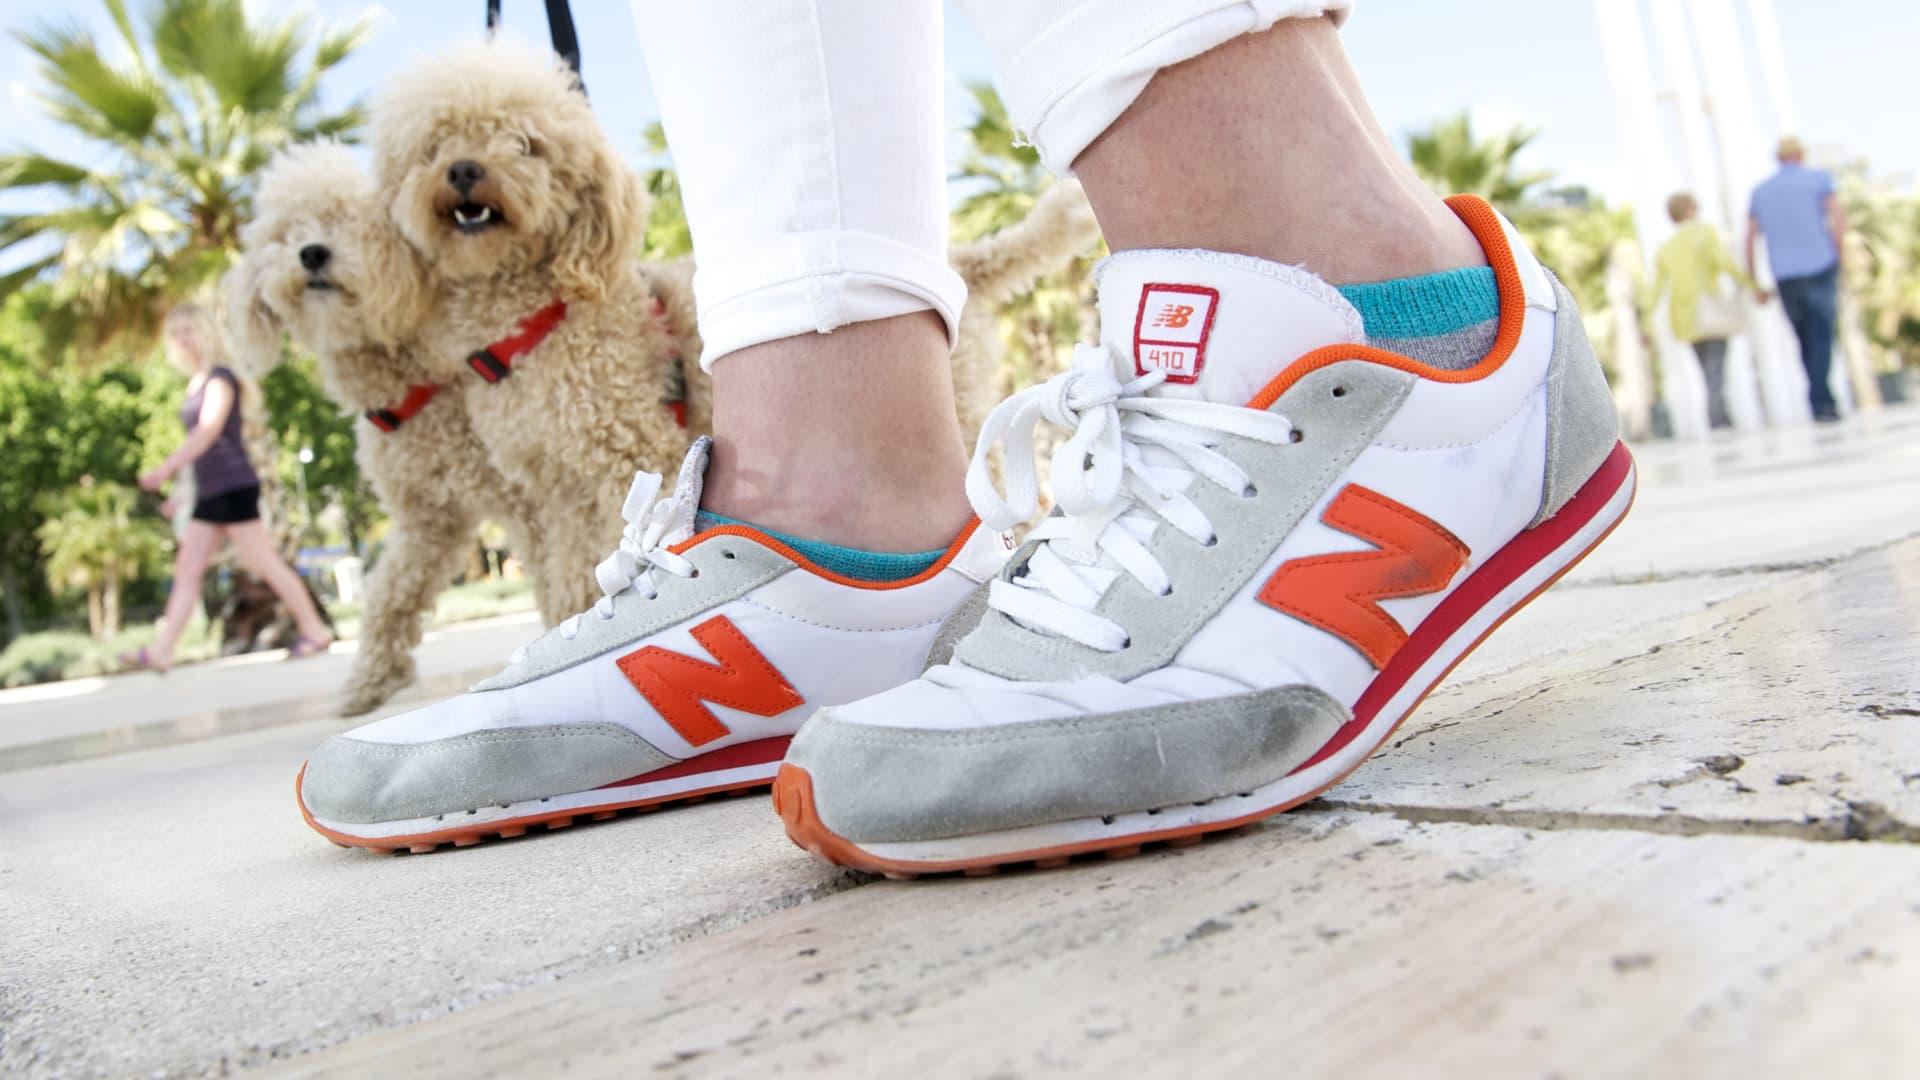 New Balance trainers.